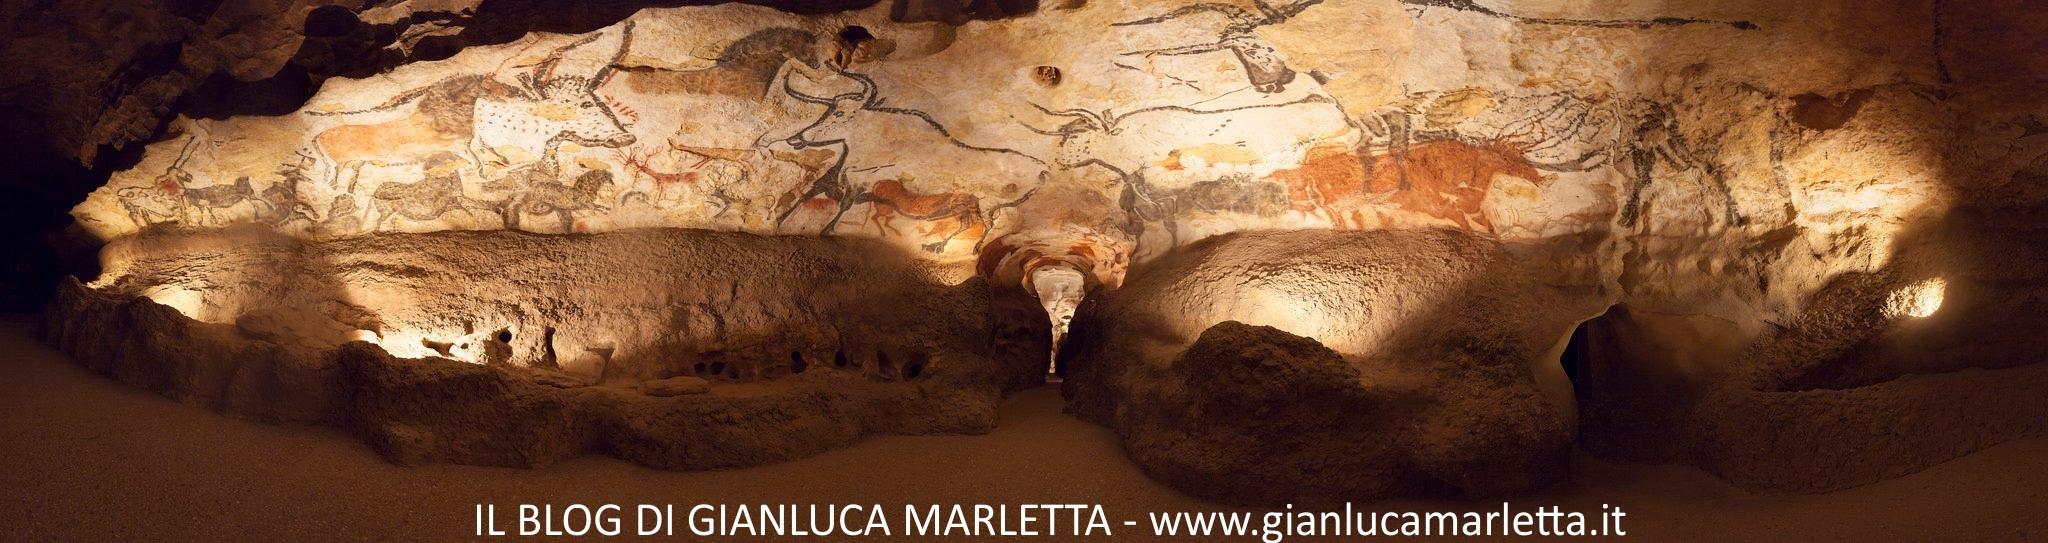 Il blog di Gianluca Marletta